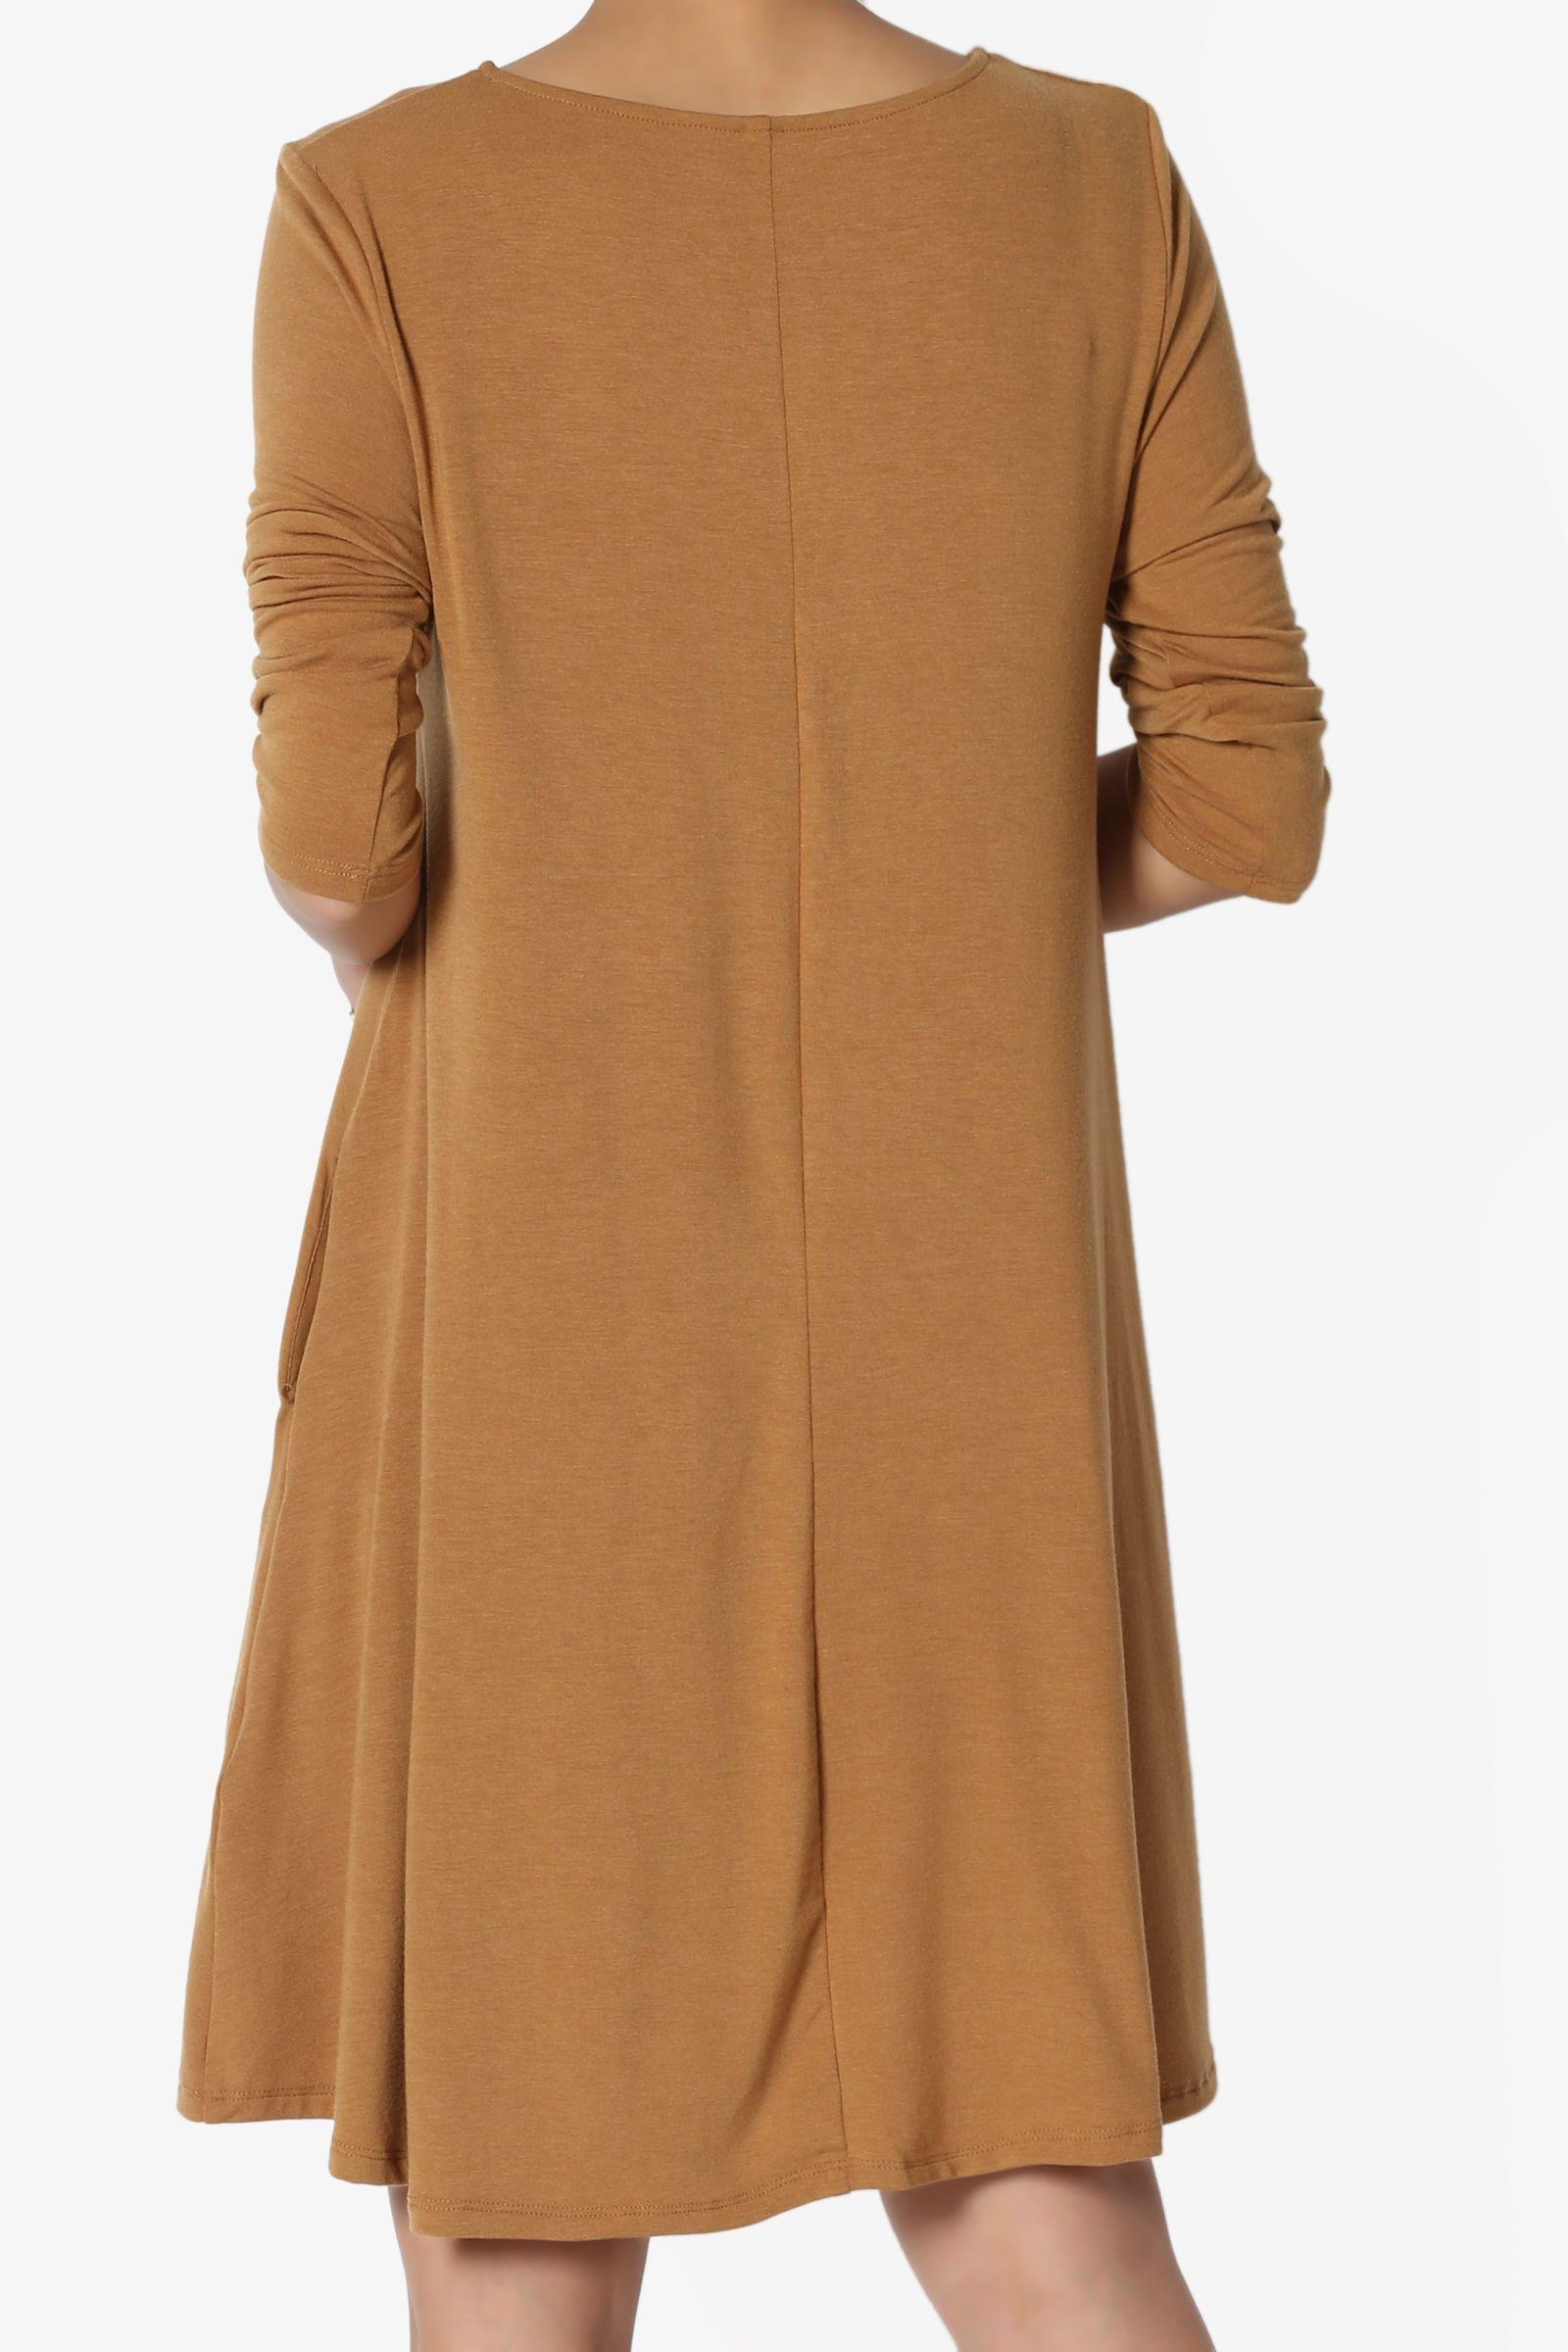 fabf66b46ef TheMogan Women s S~3XL Basic 3 4 Sleeve Swing Flared Tunic Dress Pocket Long